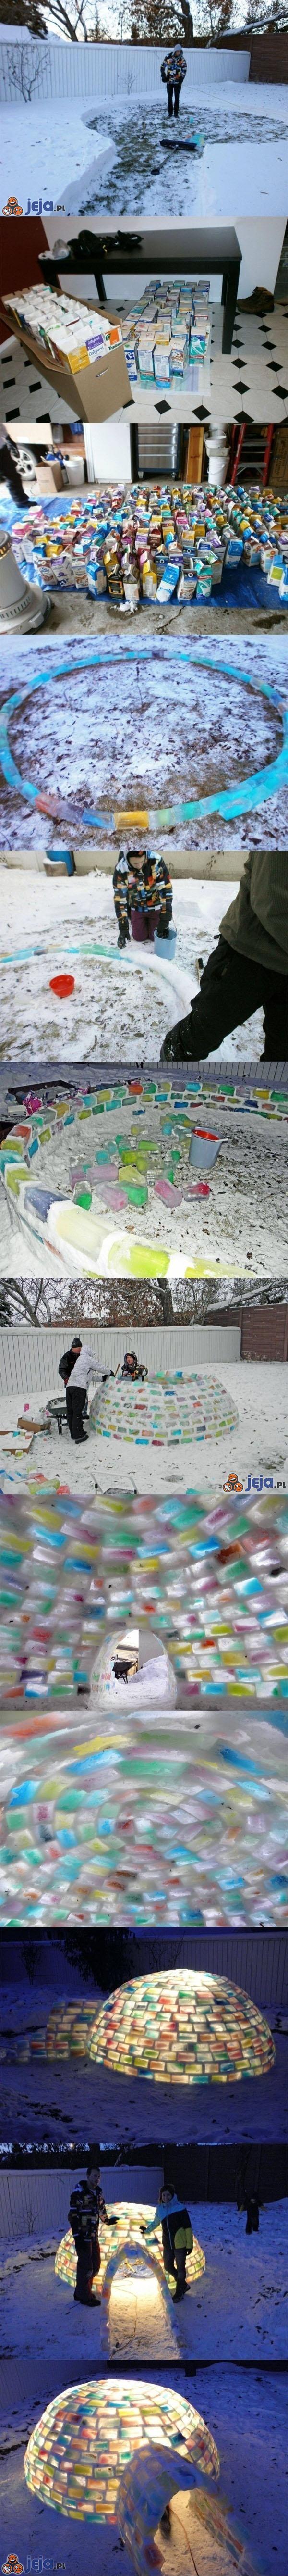 Wielokolorowe igloo